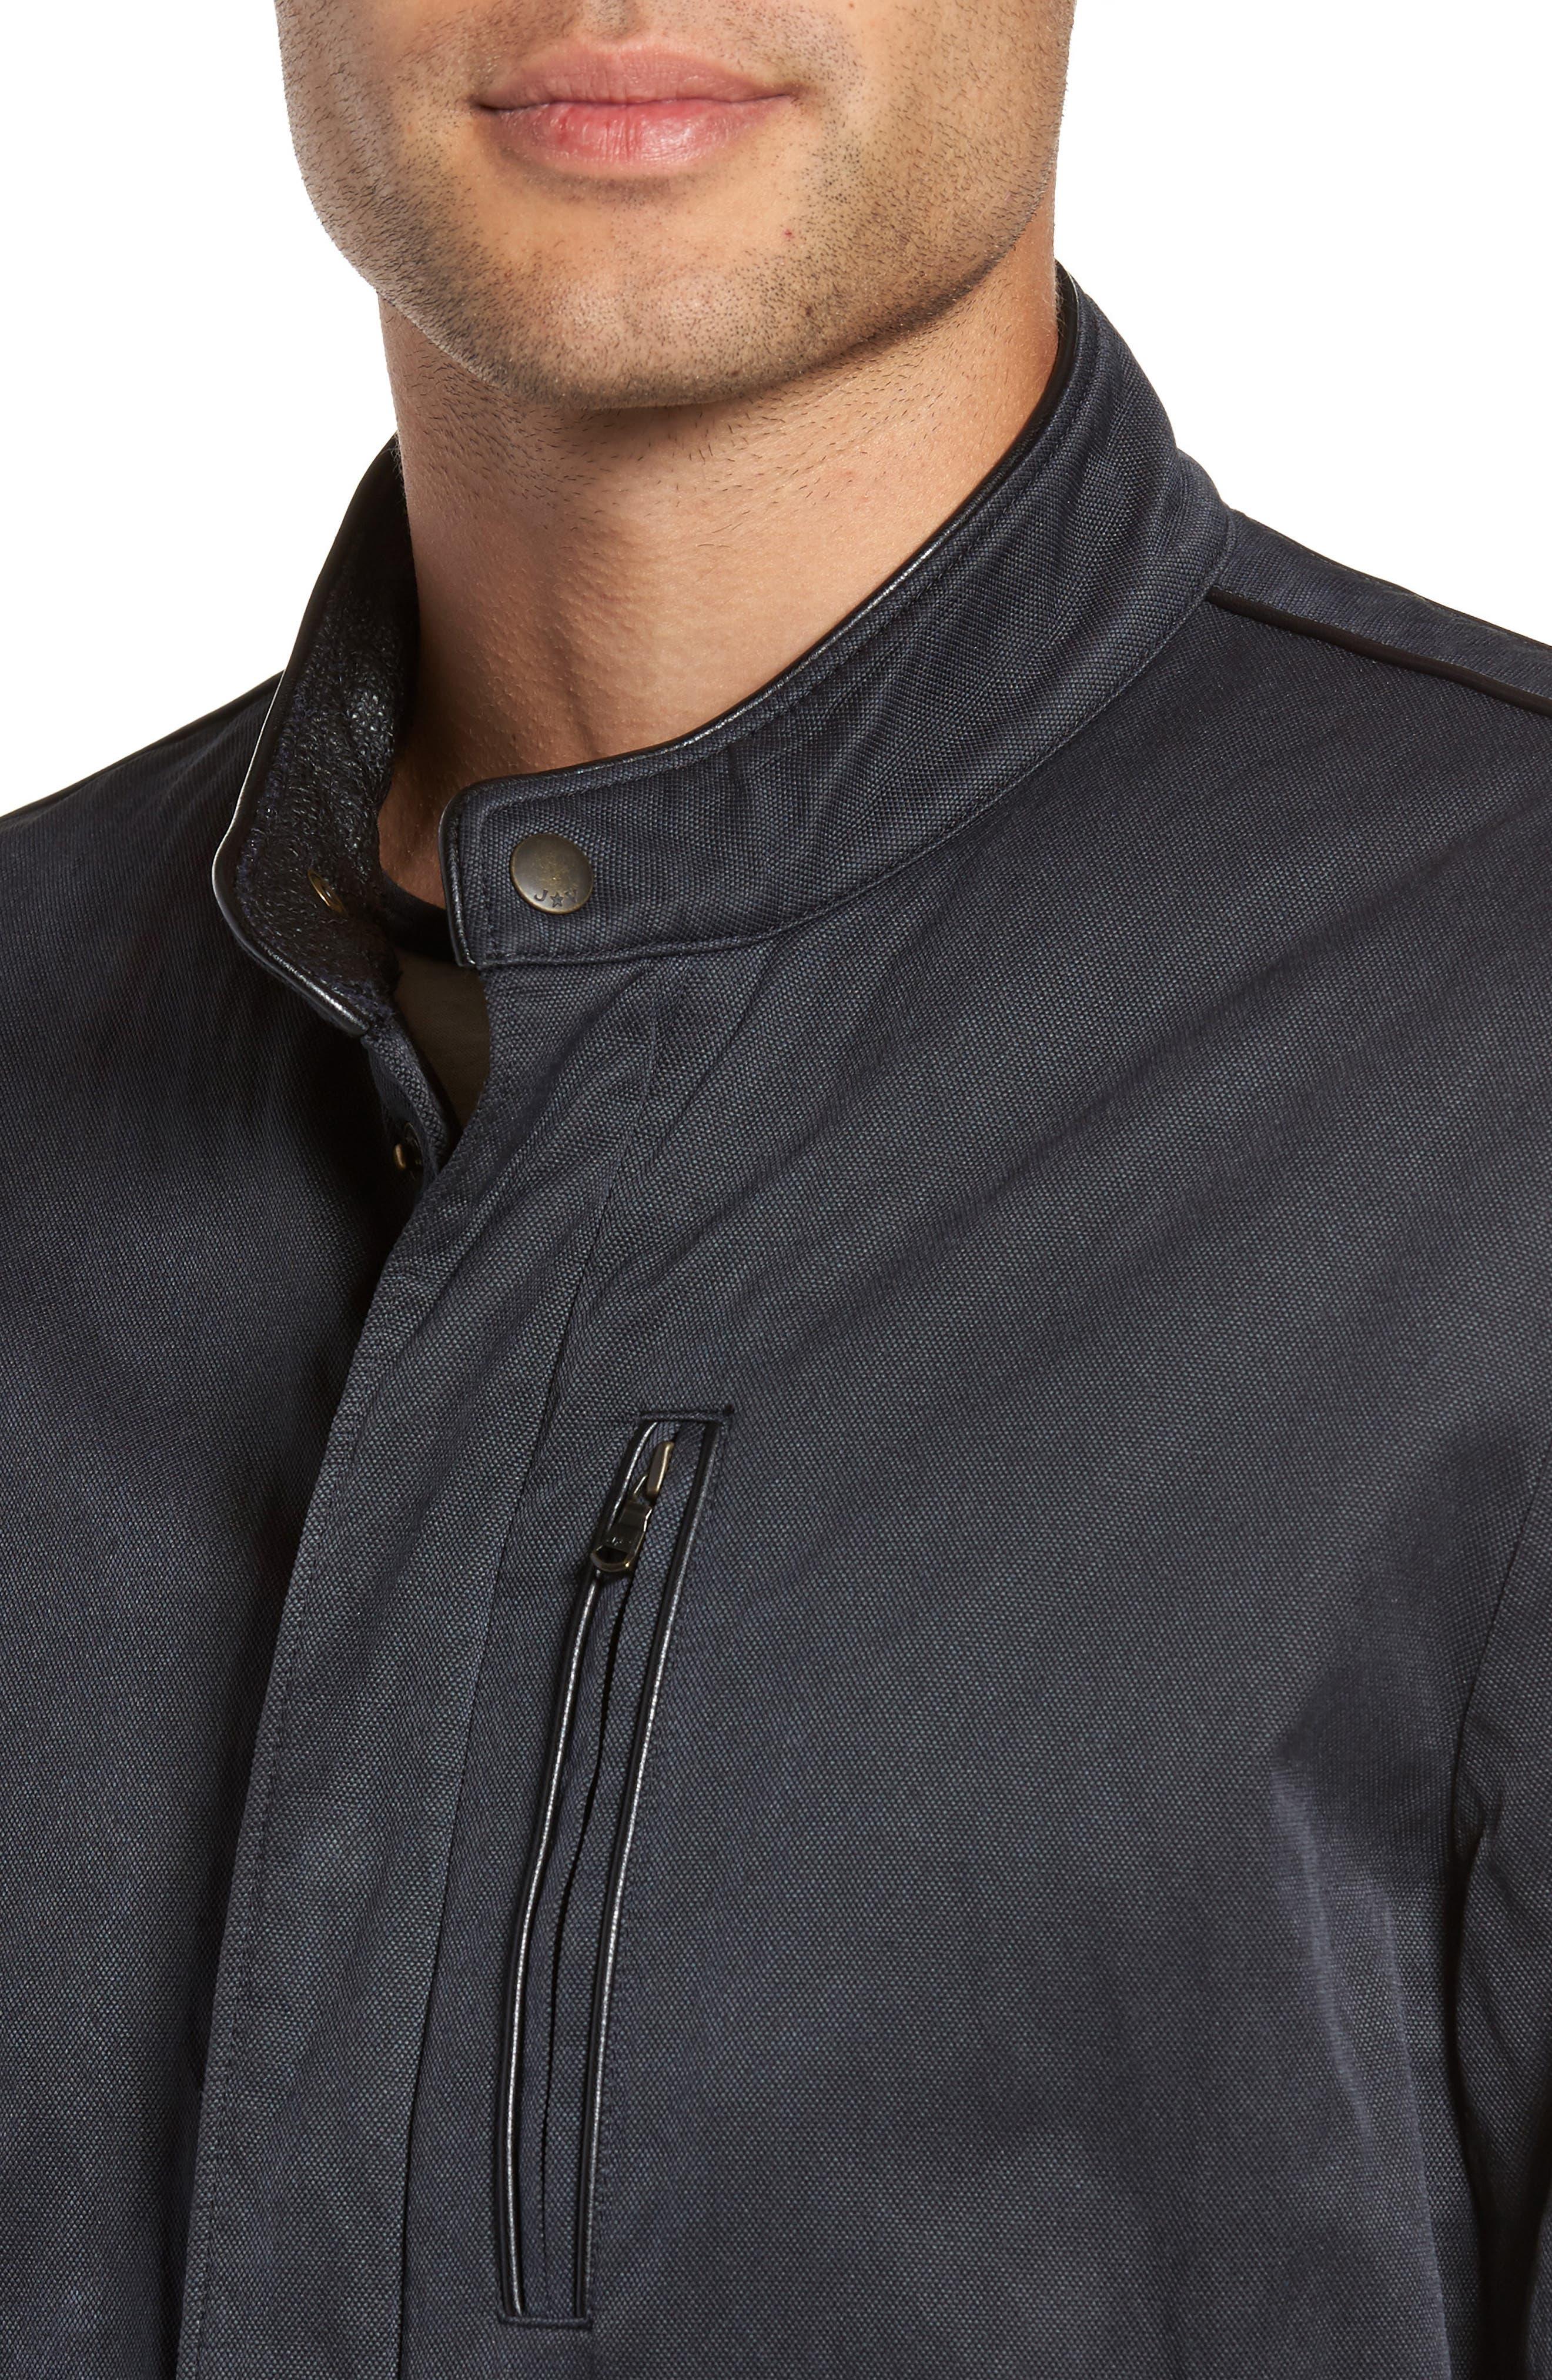 Band Collar Jacket,                             Alternate thumbnail 4, color,                             414